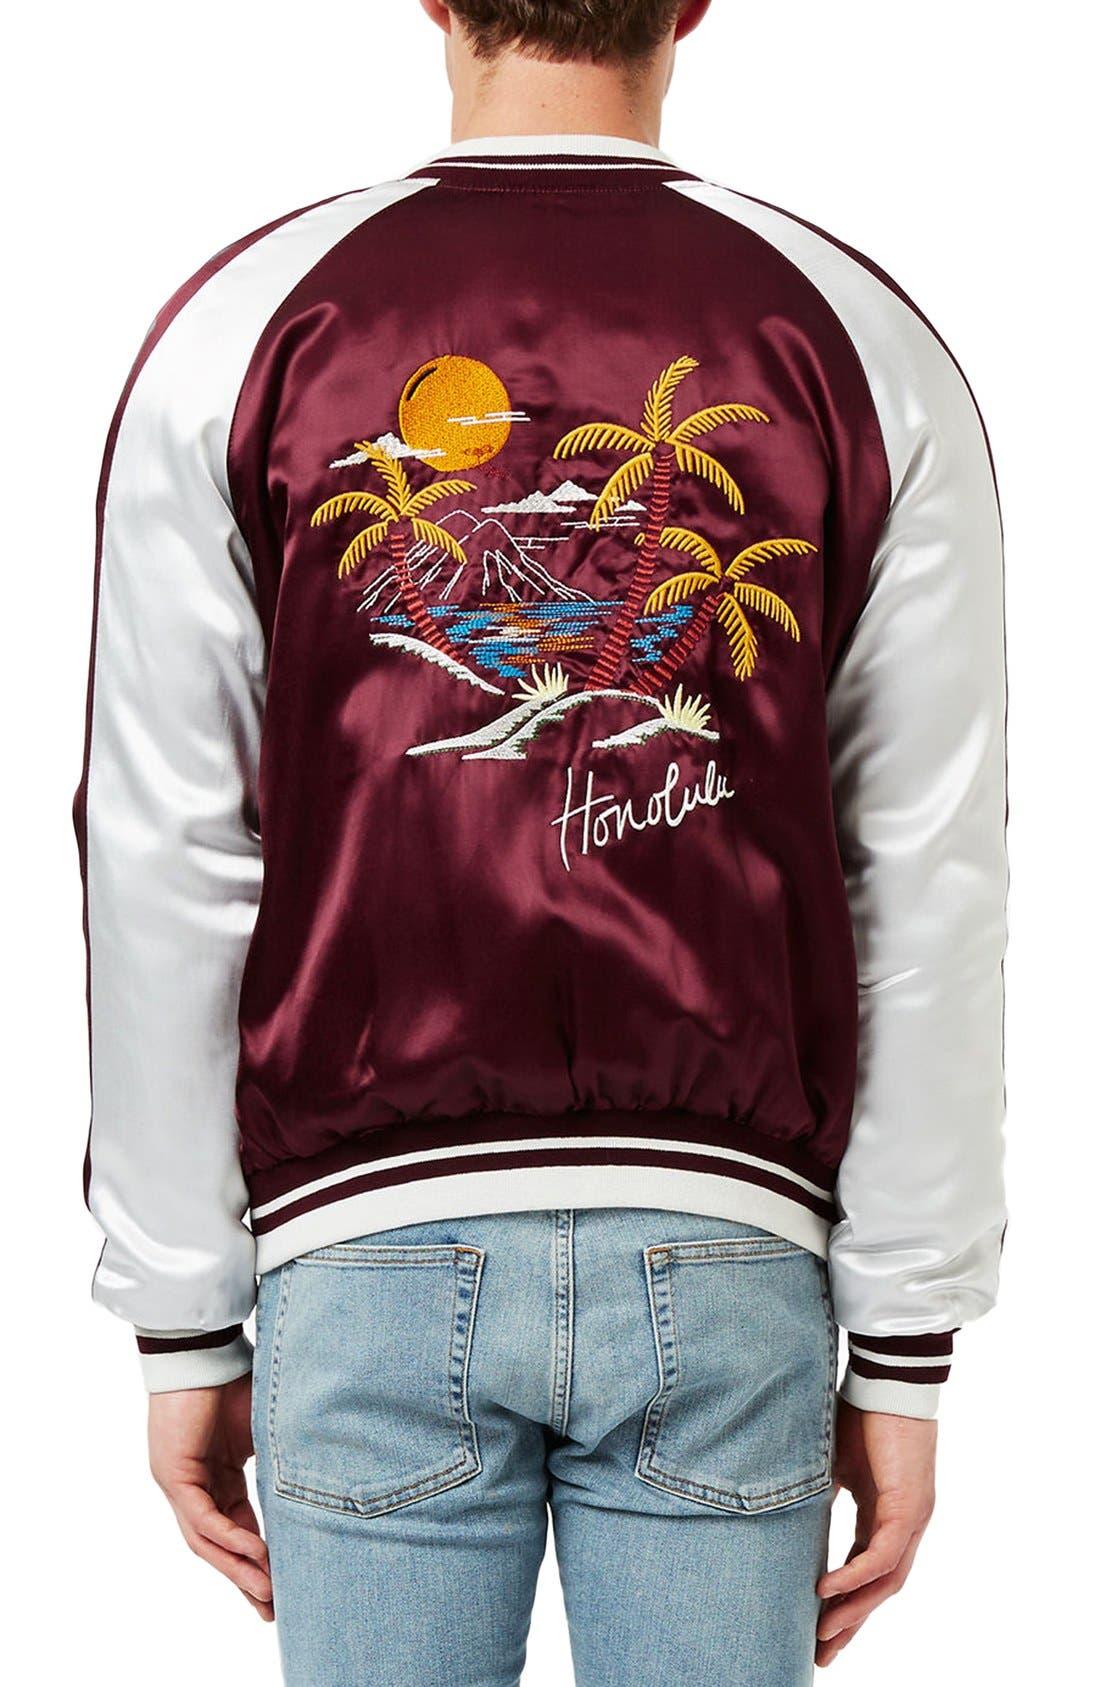 TOPMAN Embroidered Honolulu Souvenir Jacket, Main, color, 930